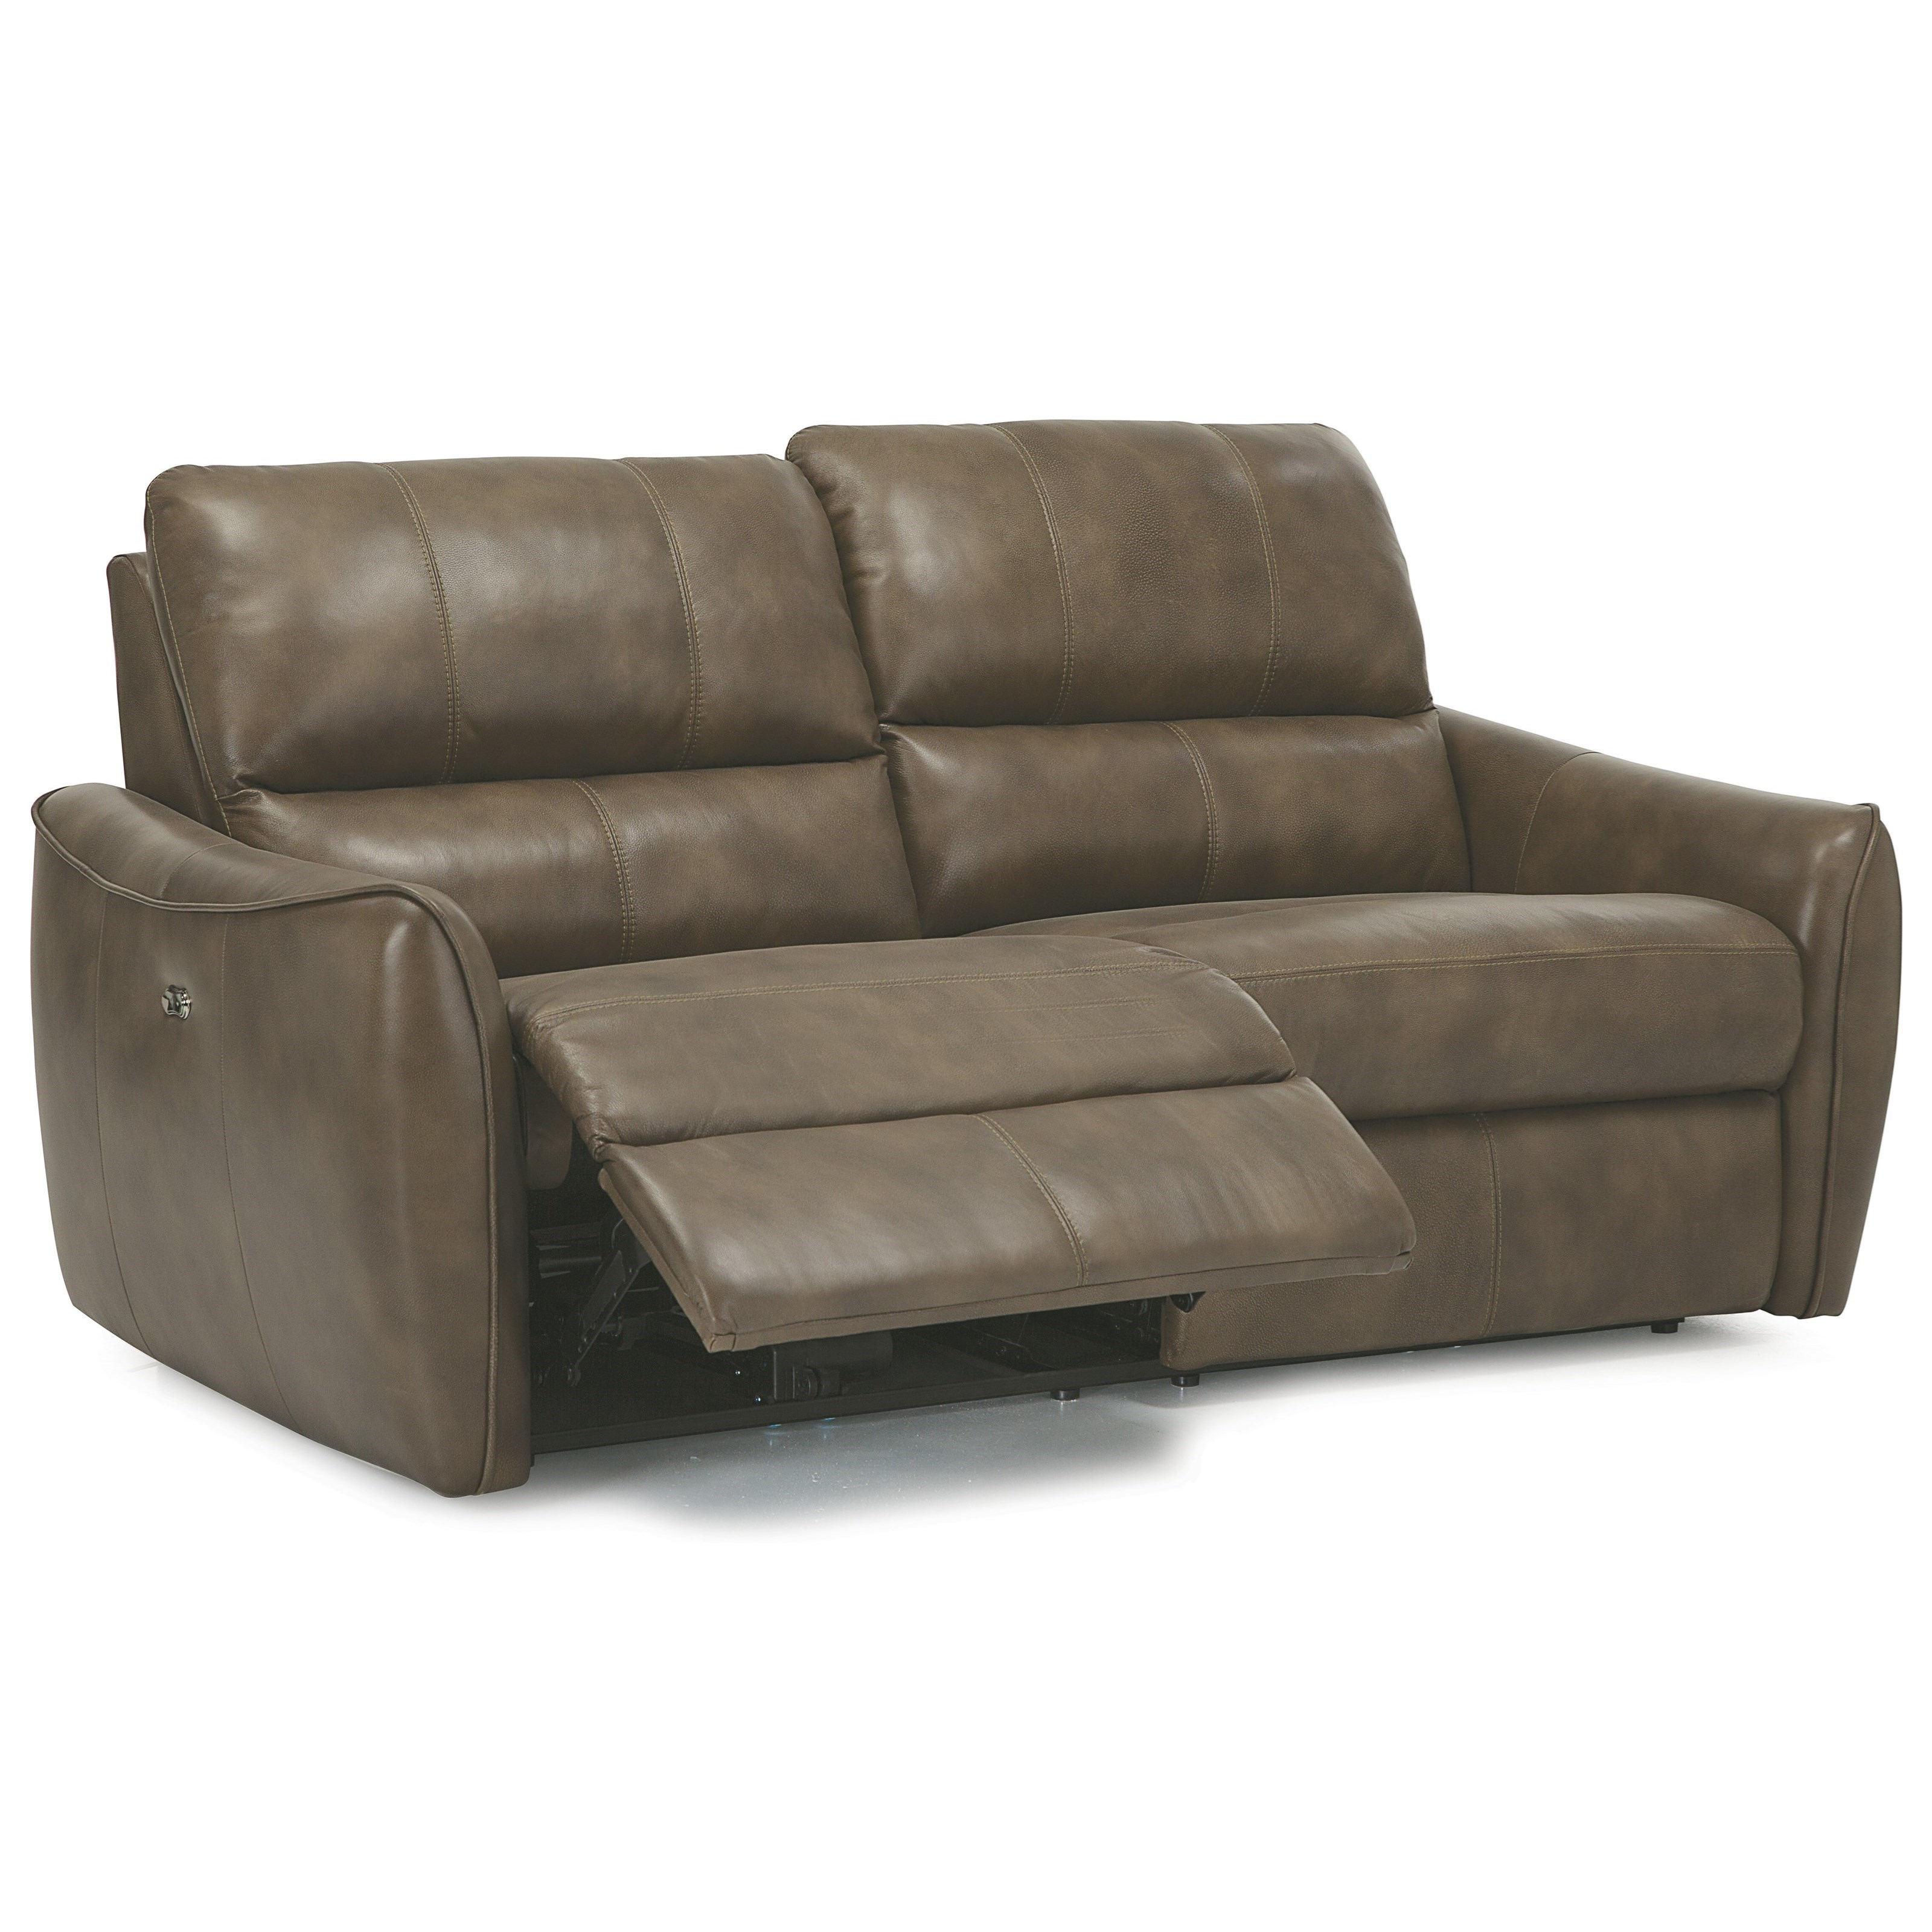 Arlo Power Sofa by Palliser at Esprit Decor Home Furnishings